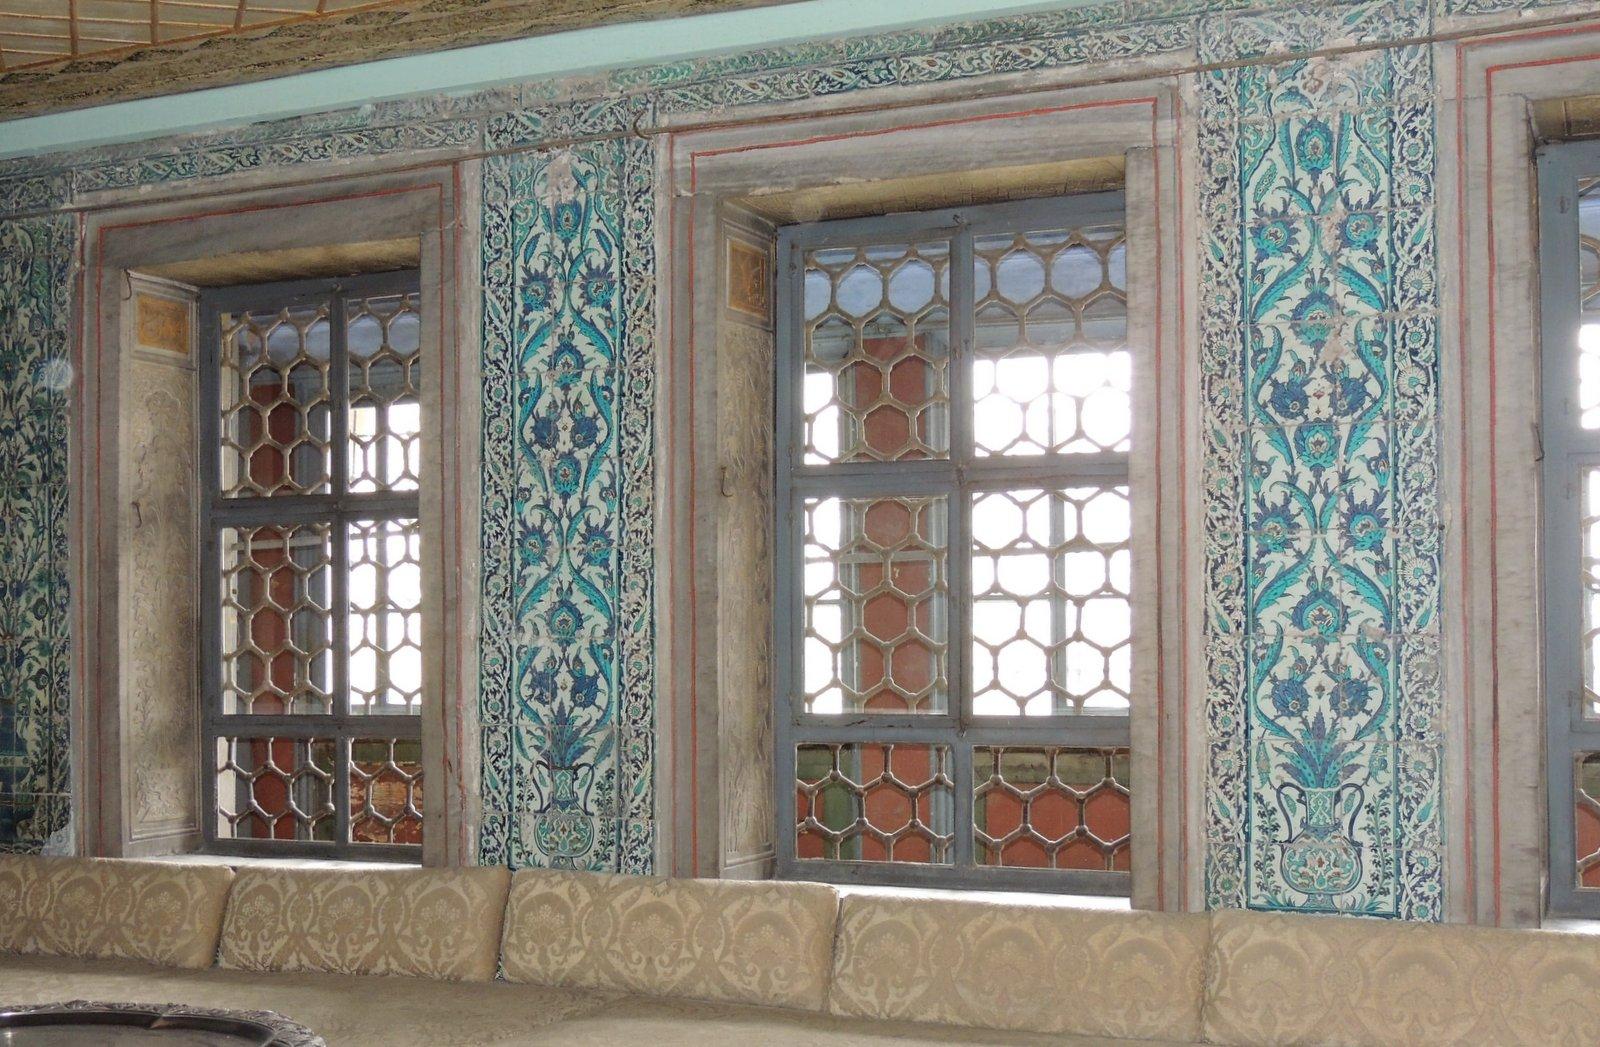 Sultanspalast Topkapi Istanbul